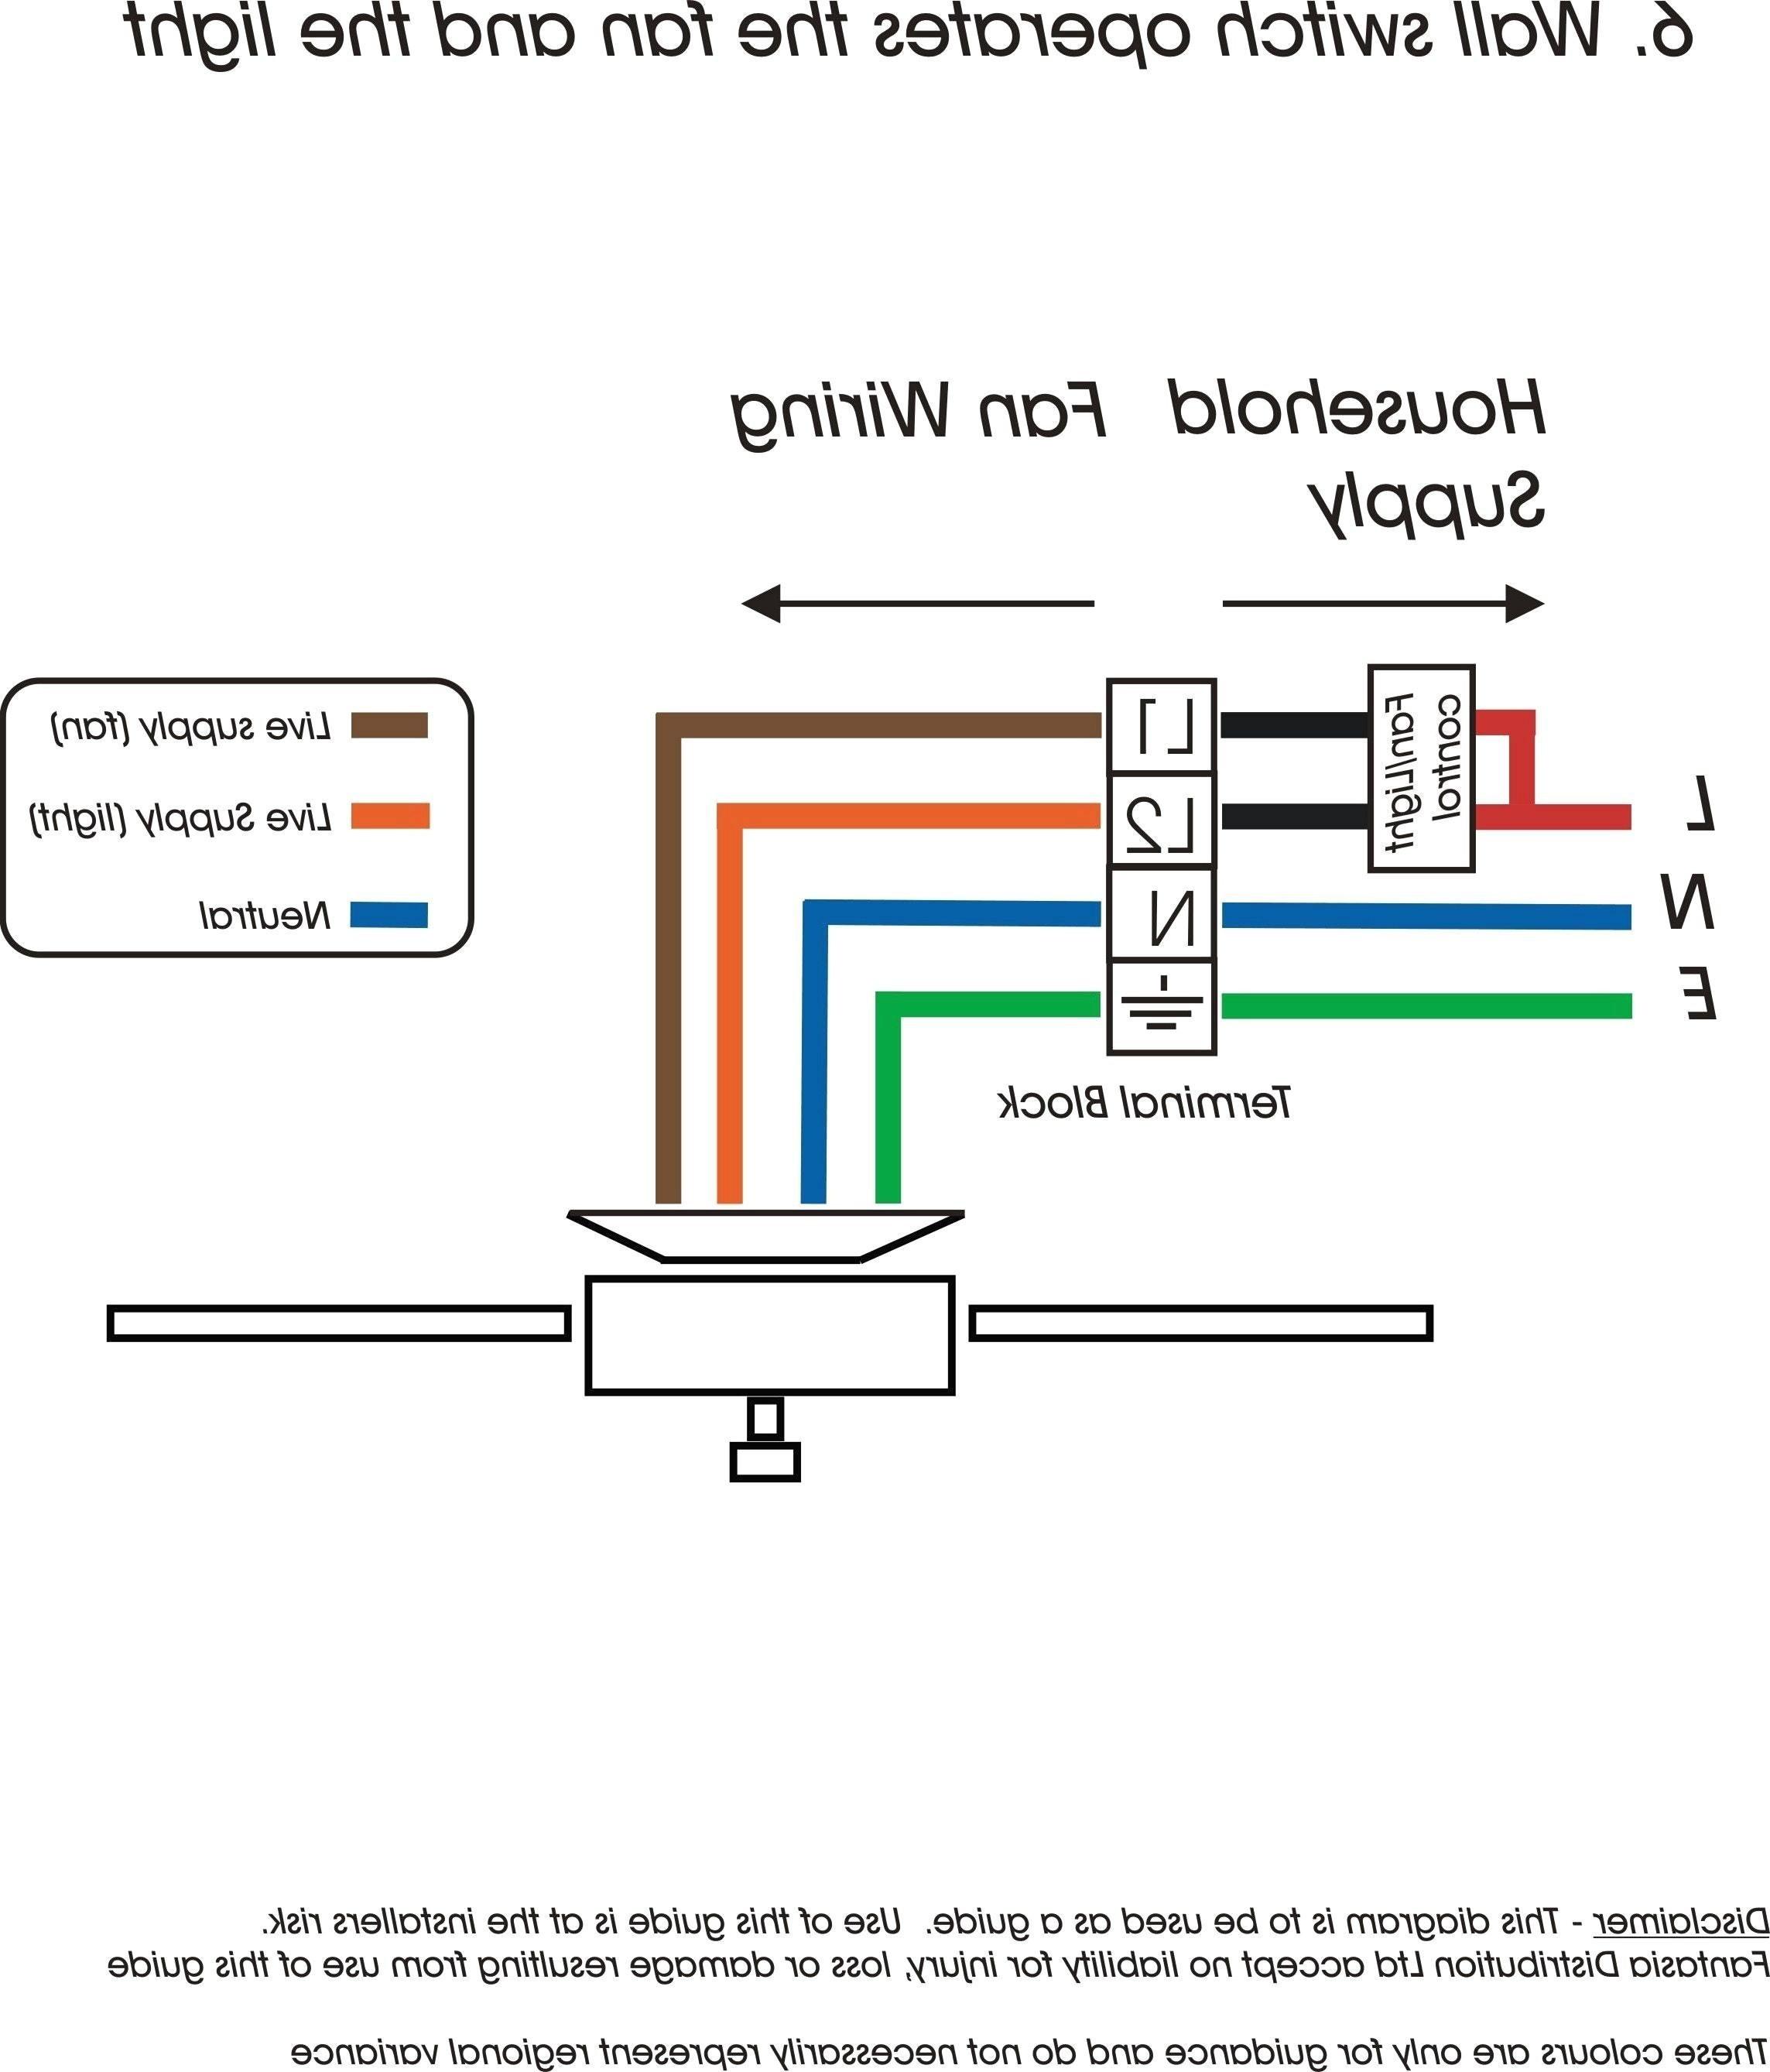 Wiring Diagram for 2002 toyota Tacoma Diagram] 2012 Ta Fog Lights Wiring Diagram Full Version Hd Of Wiring Diagram for 2002 toyota Tacoma